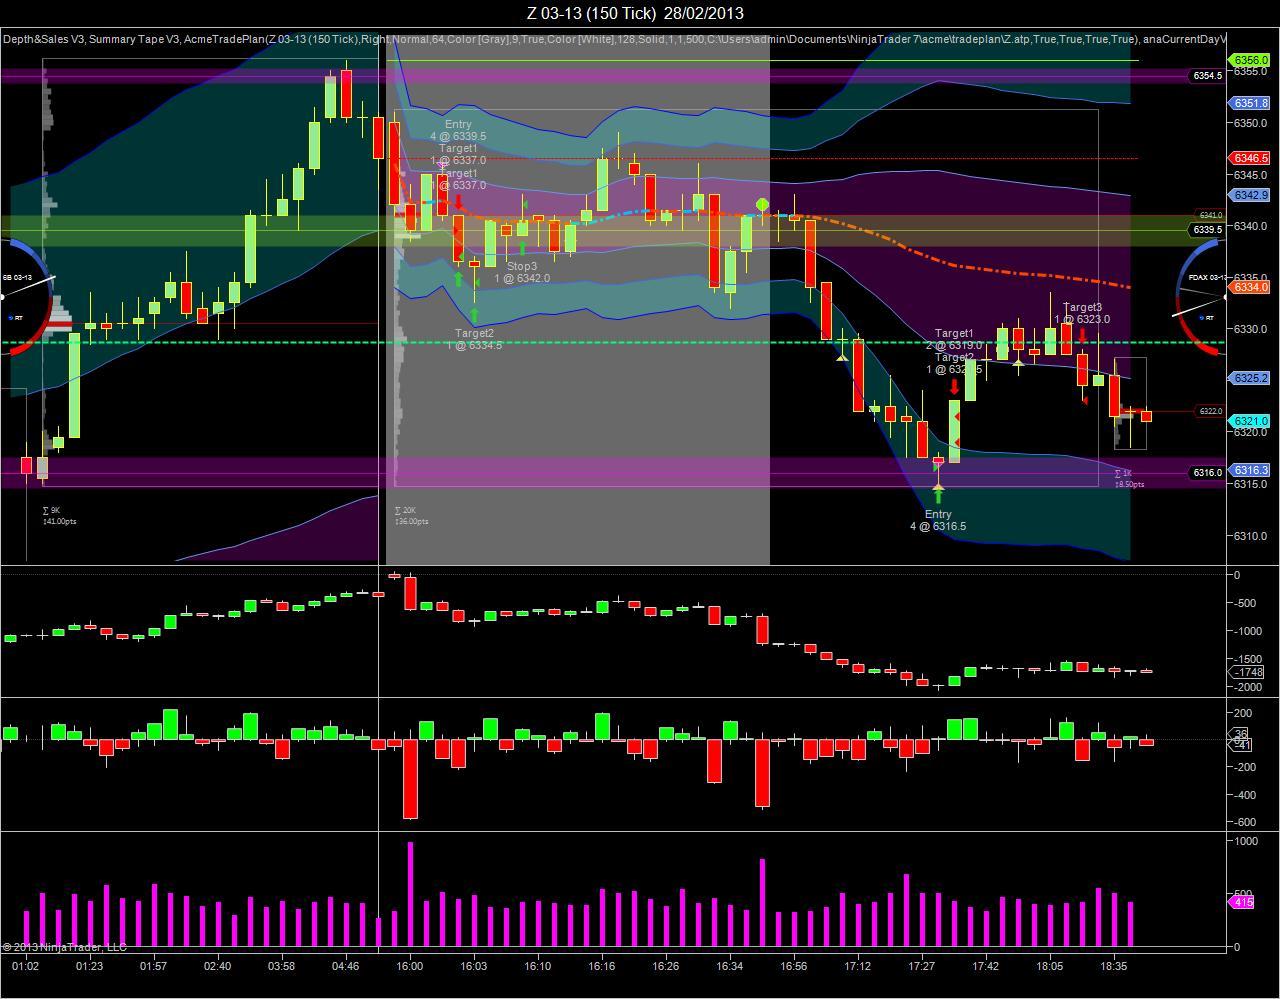 z-03-13-150-tick-28_02_2013-2-trades.jpg